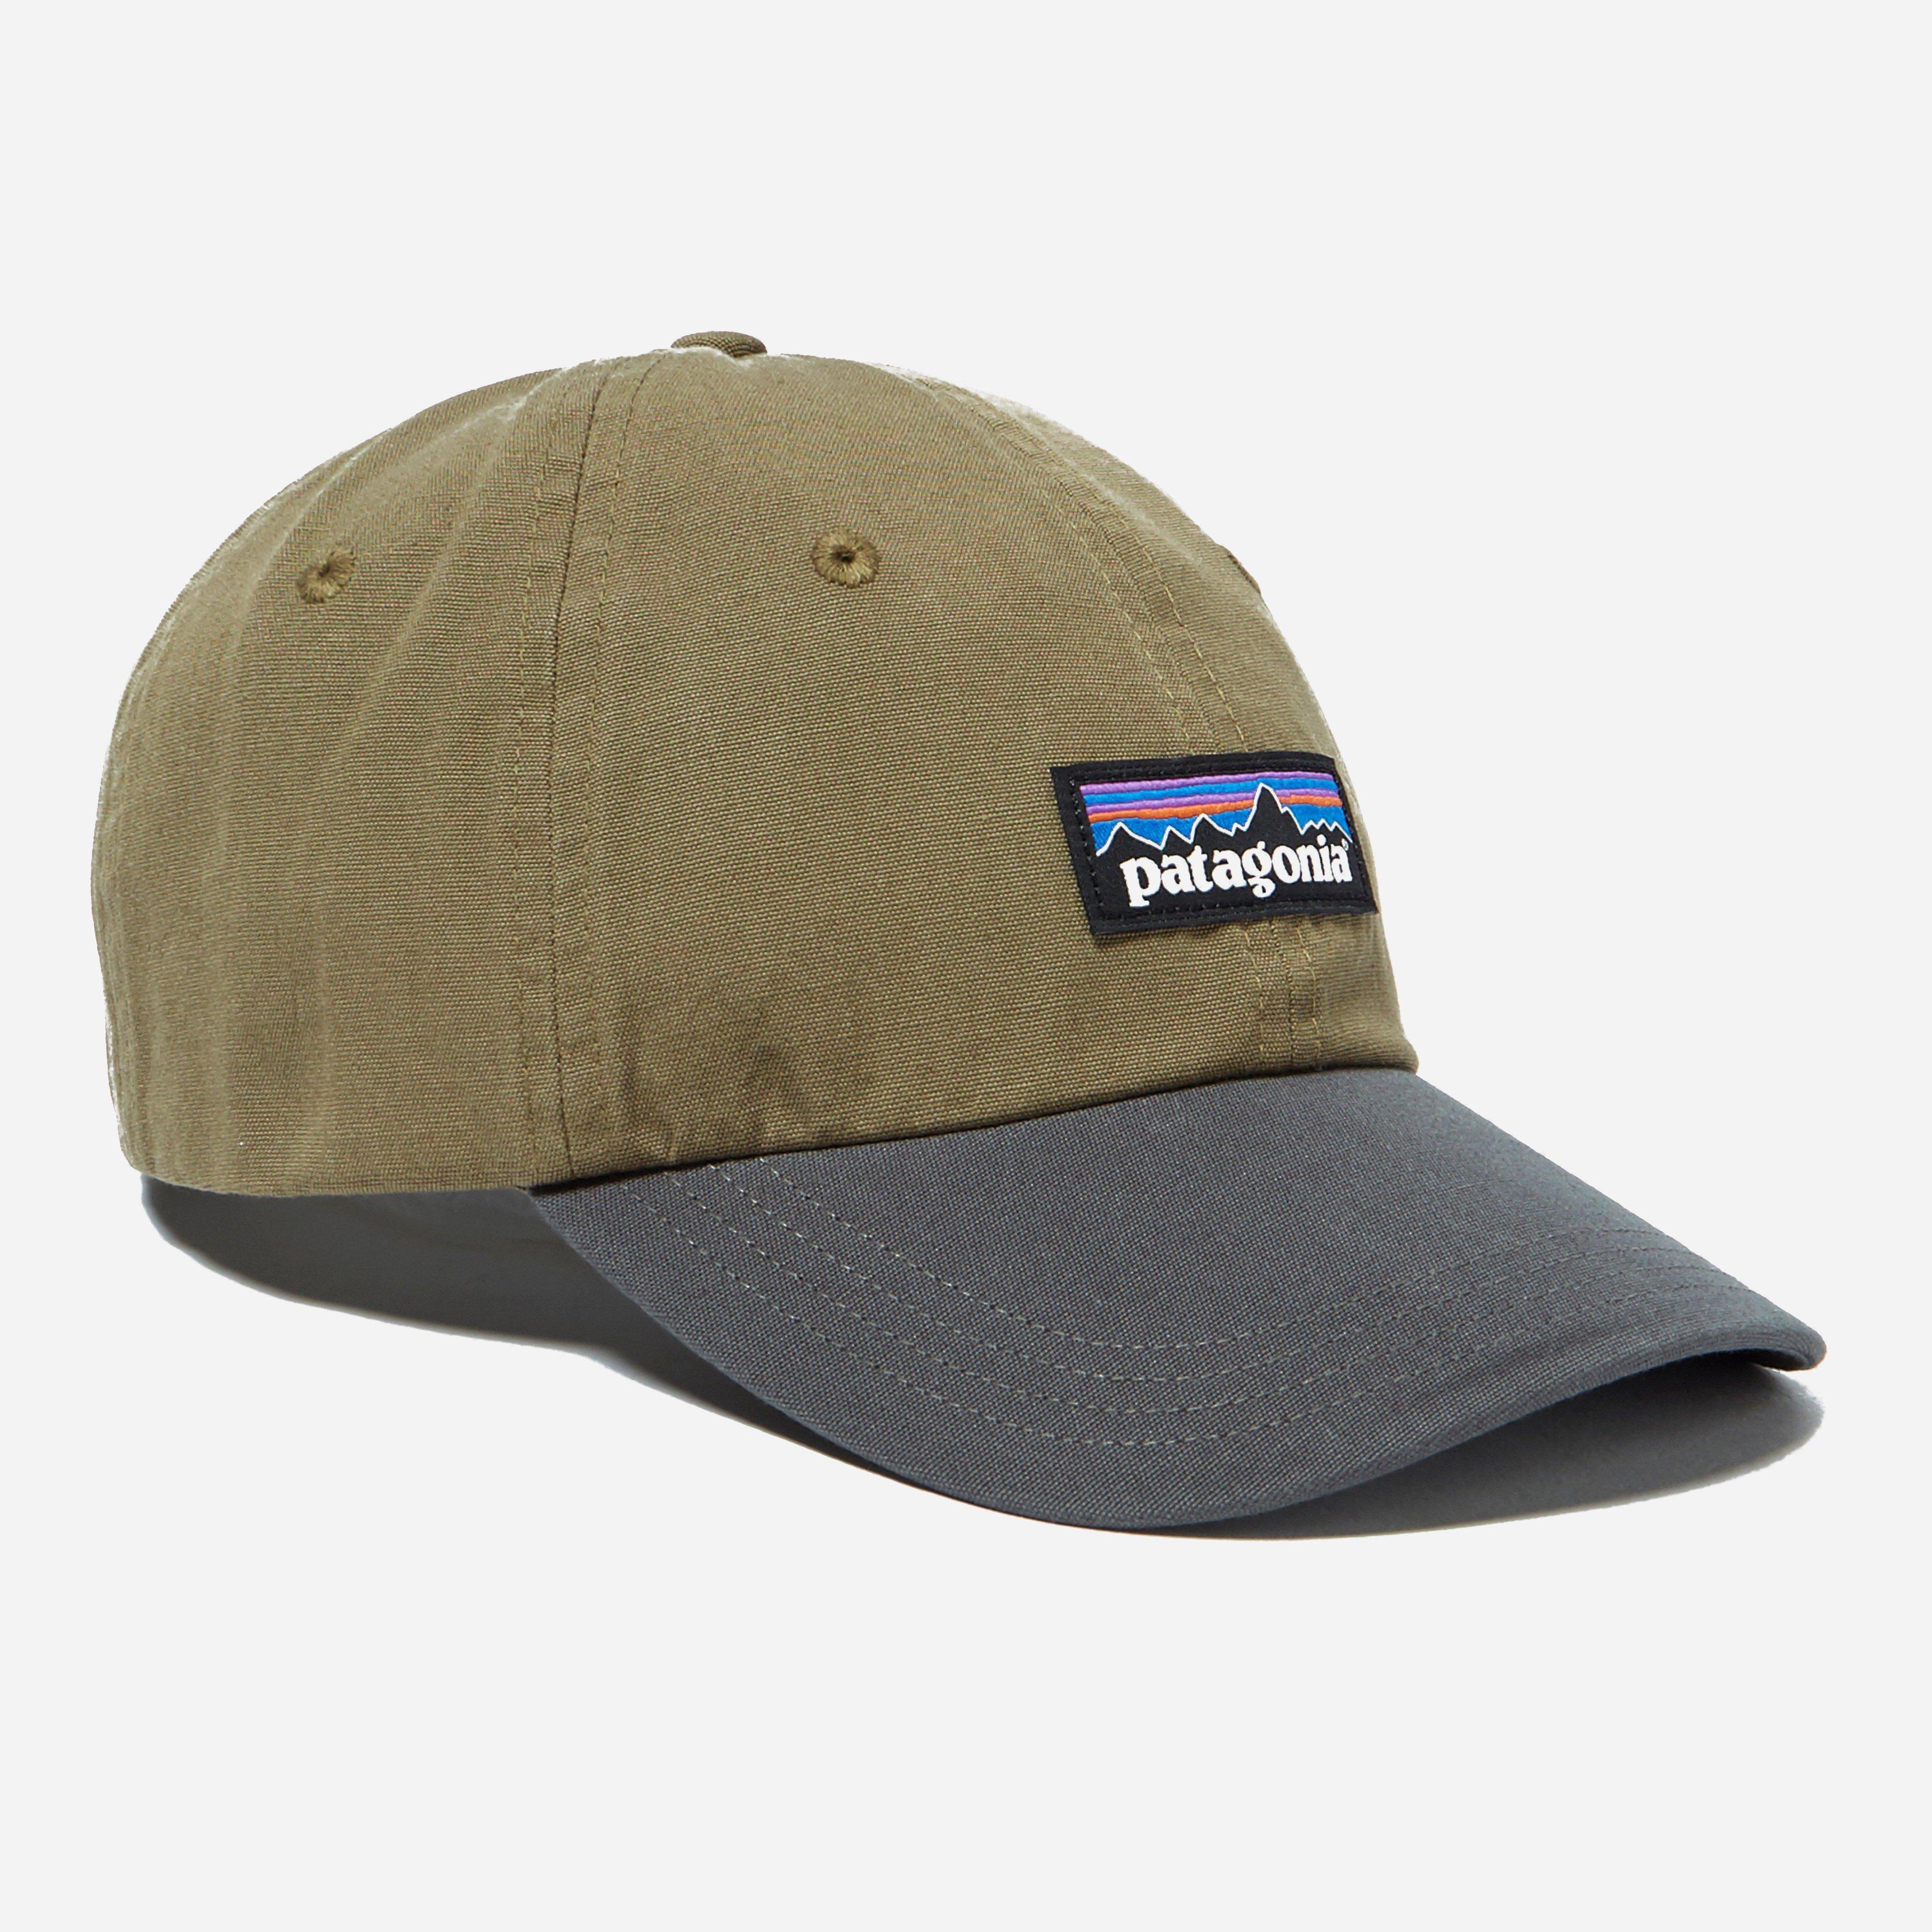 Lyst - Patagonia P6 Label Trad Cap in Green for Men 64e58c1fe8b